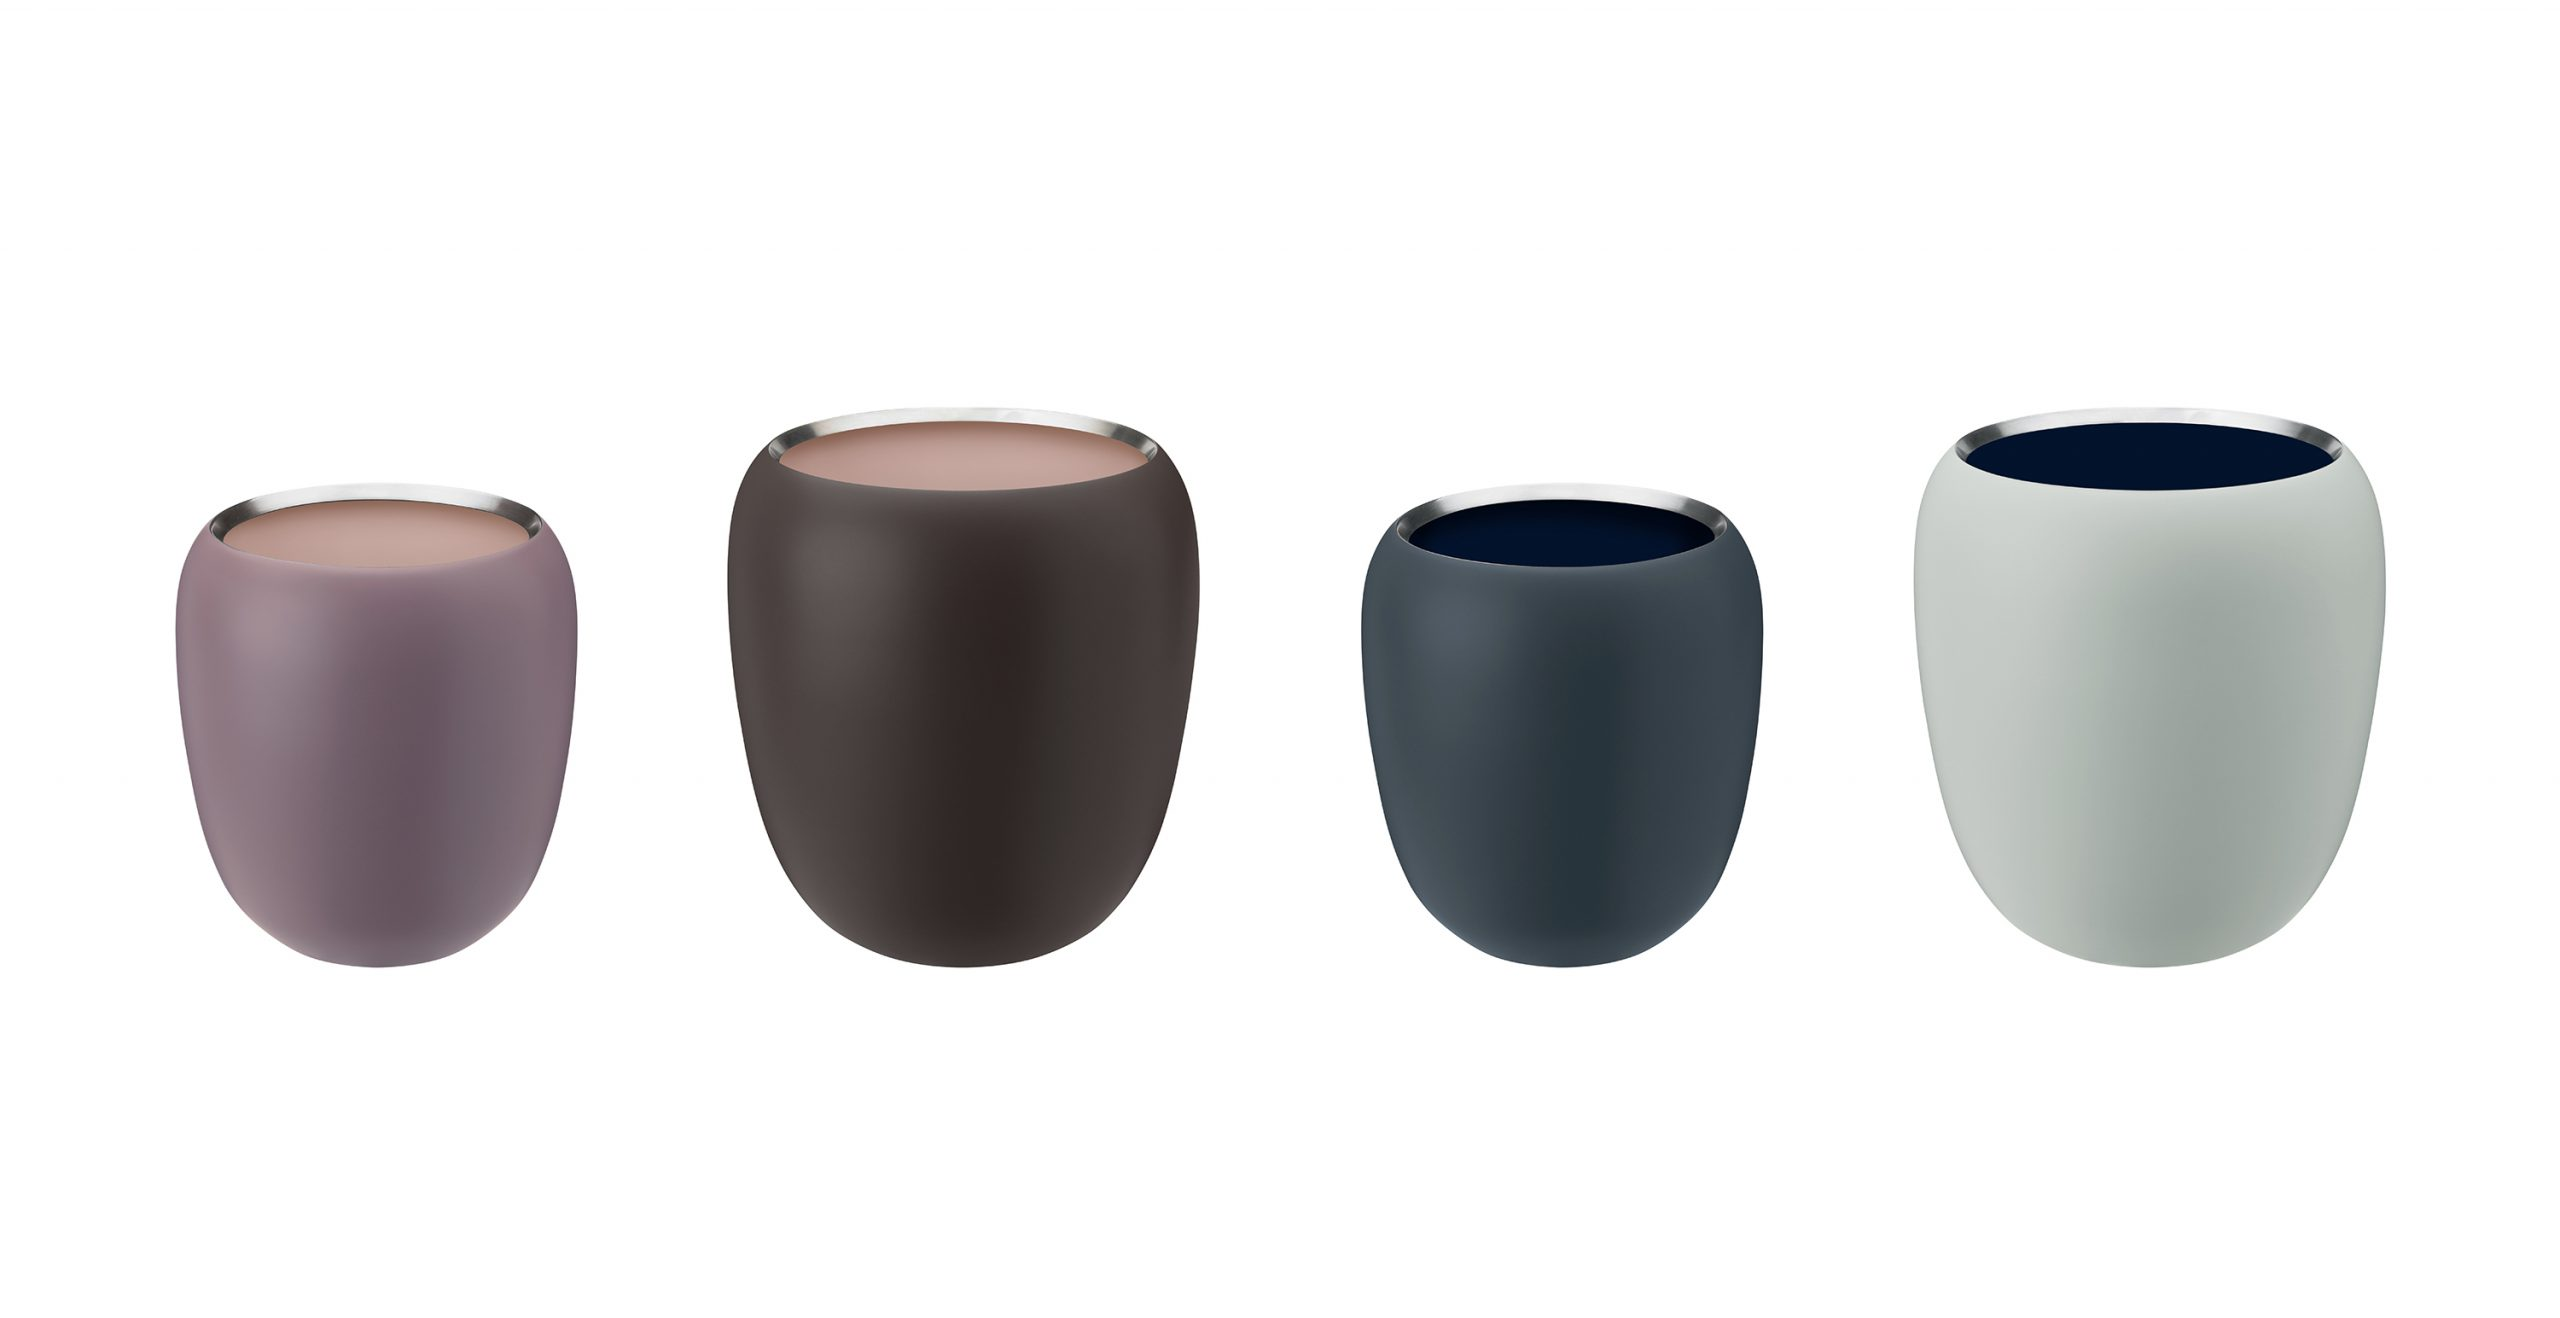 Ora Vases designed by Debiasi Sandri for Stelton